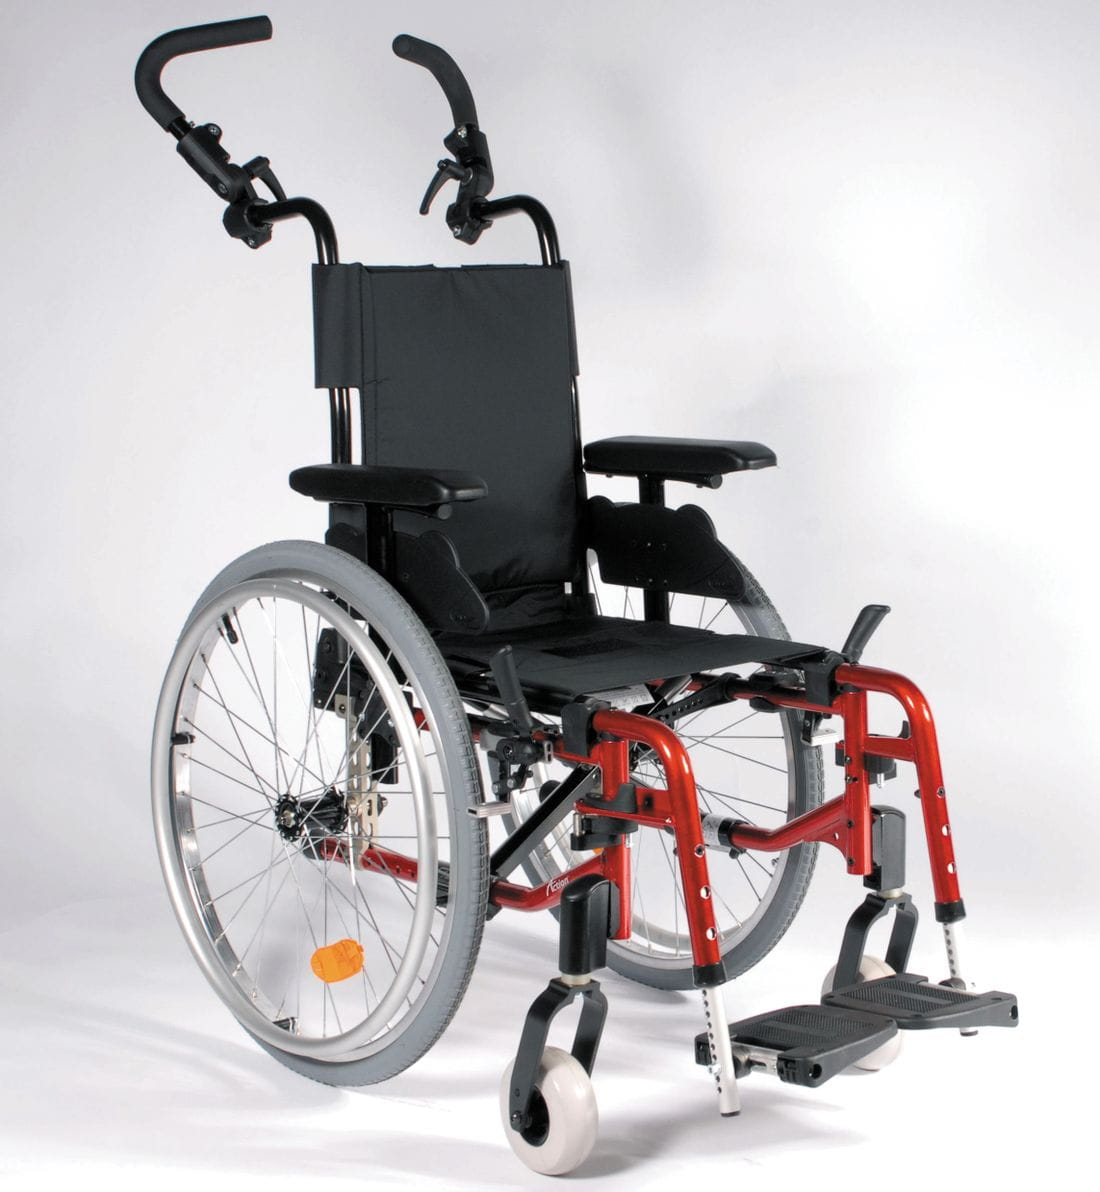 Cadira de Rodes ACTION 3 JUNIOR nous punys d'empenyement